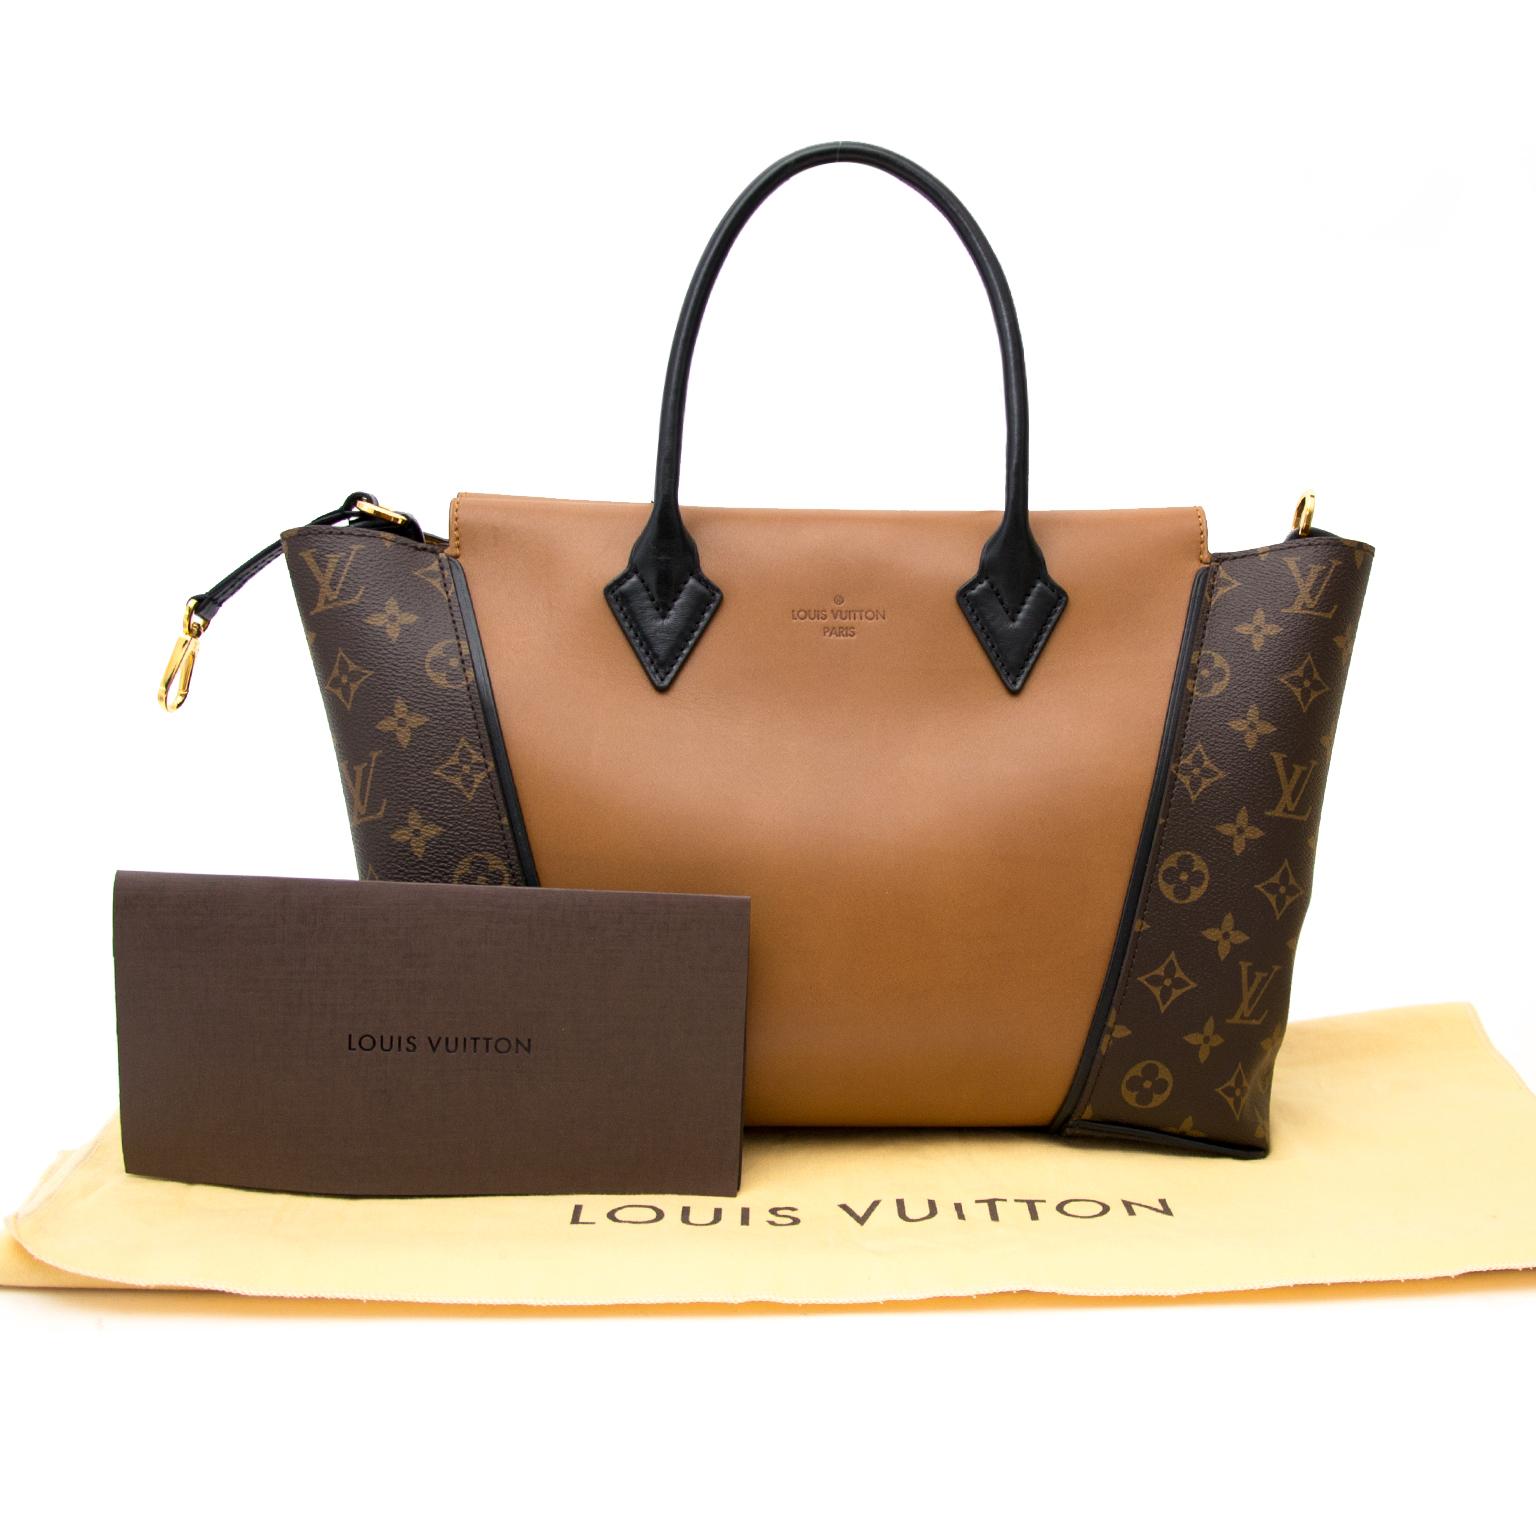 350a2256cd6 ... shop safe online secondhand Louis Vuitton Limited W Cuir Orfevre Tote  Noisette PM Bag online at